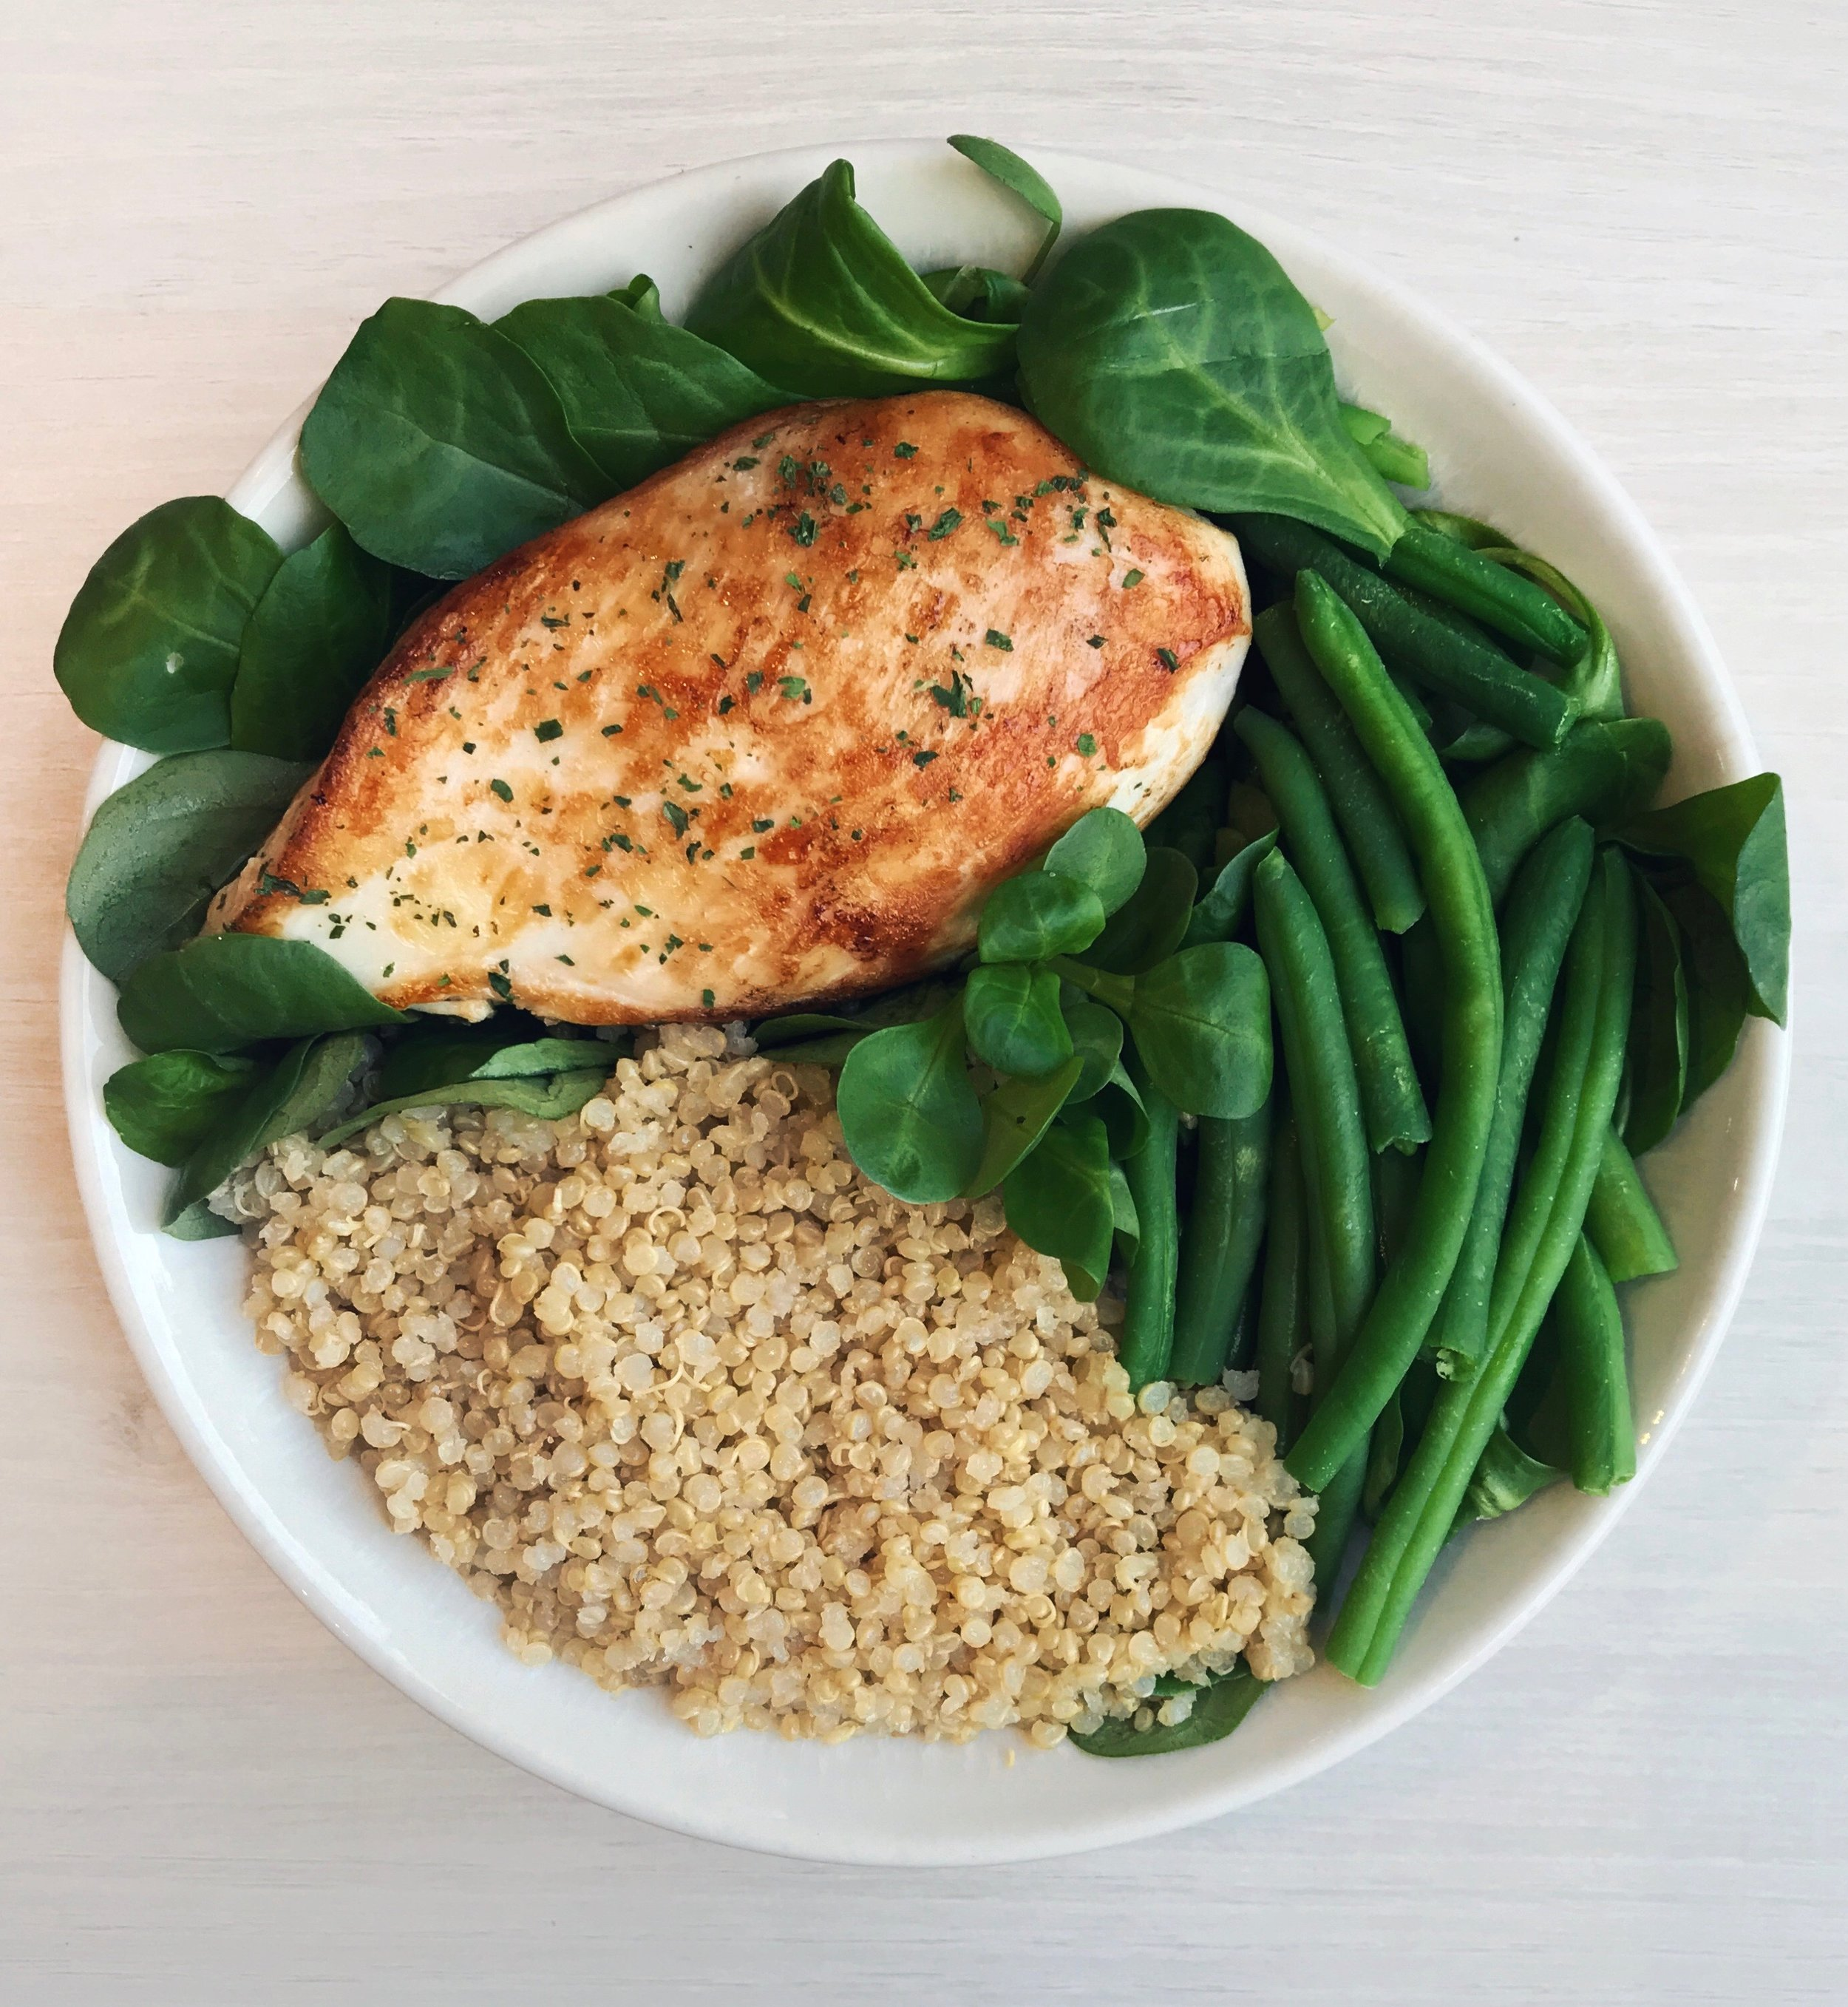 Chicken, Quinoa, Green Beans & Olive Oil